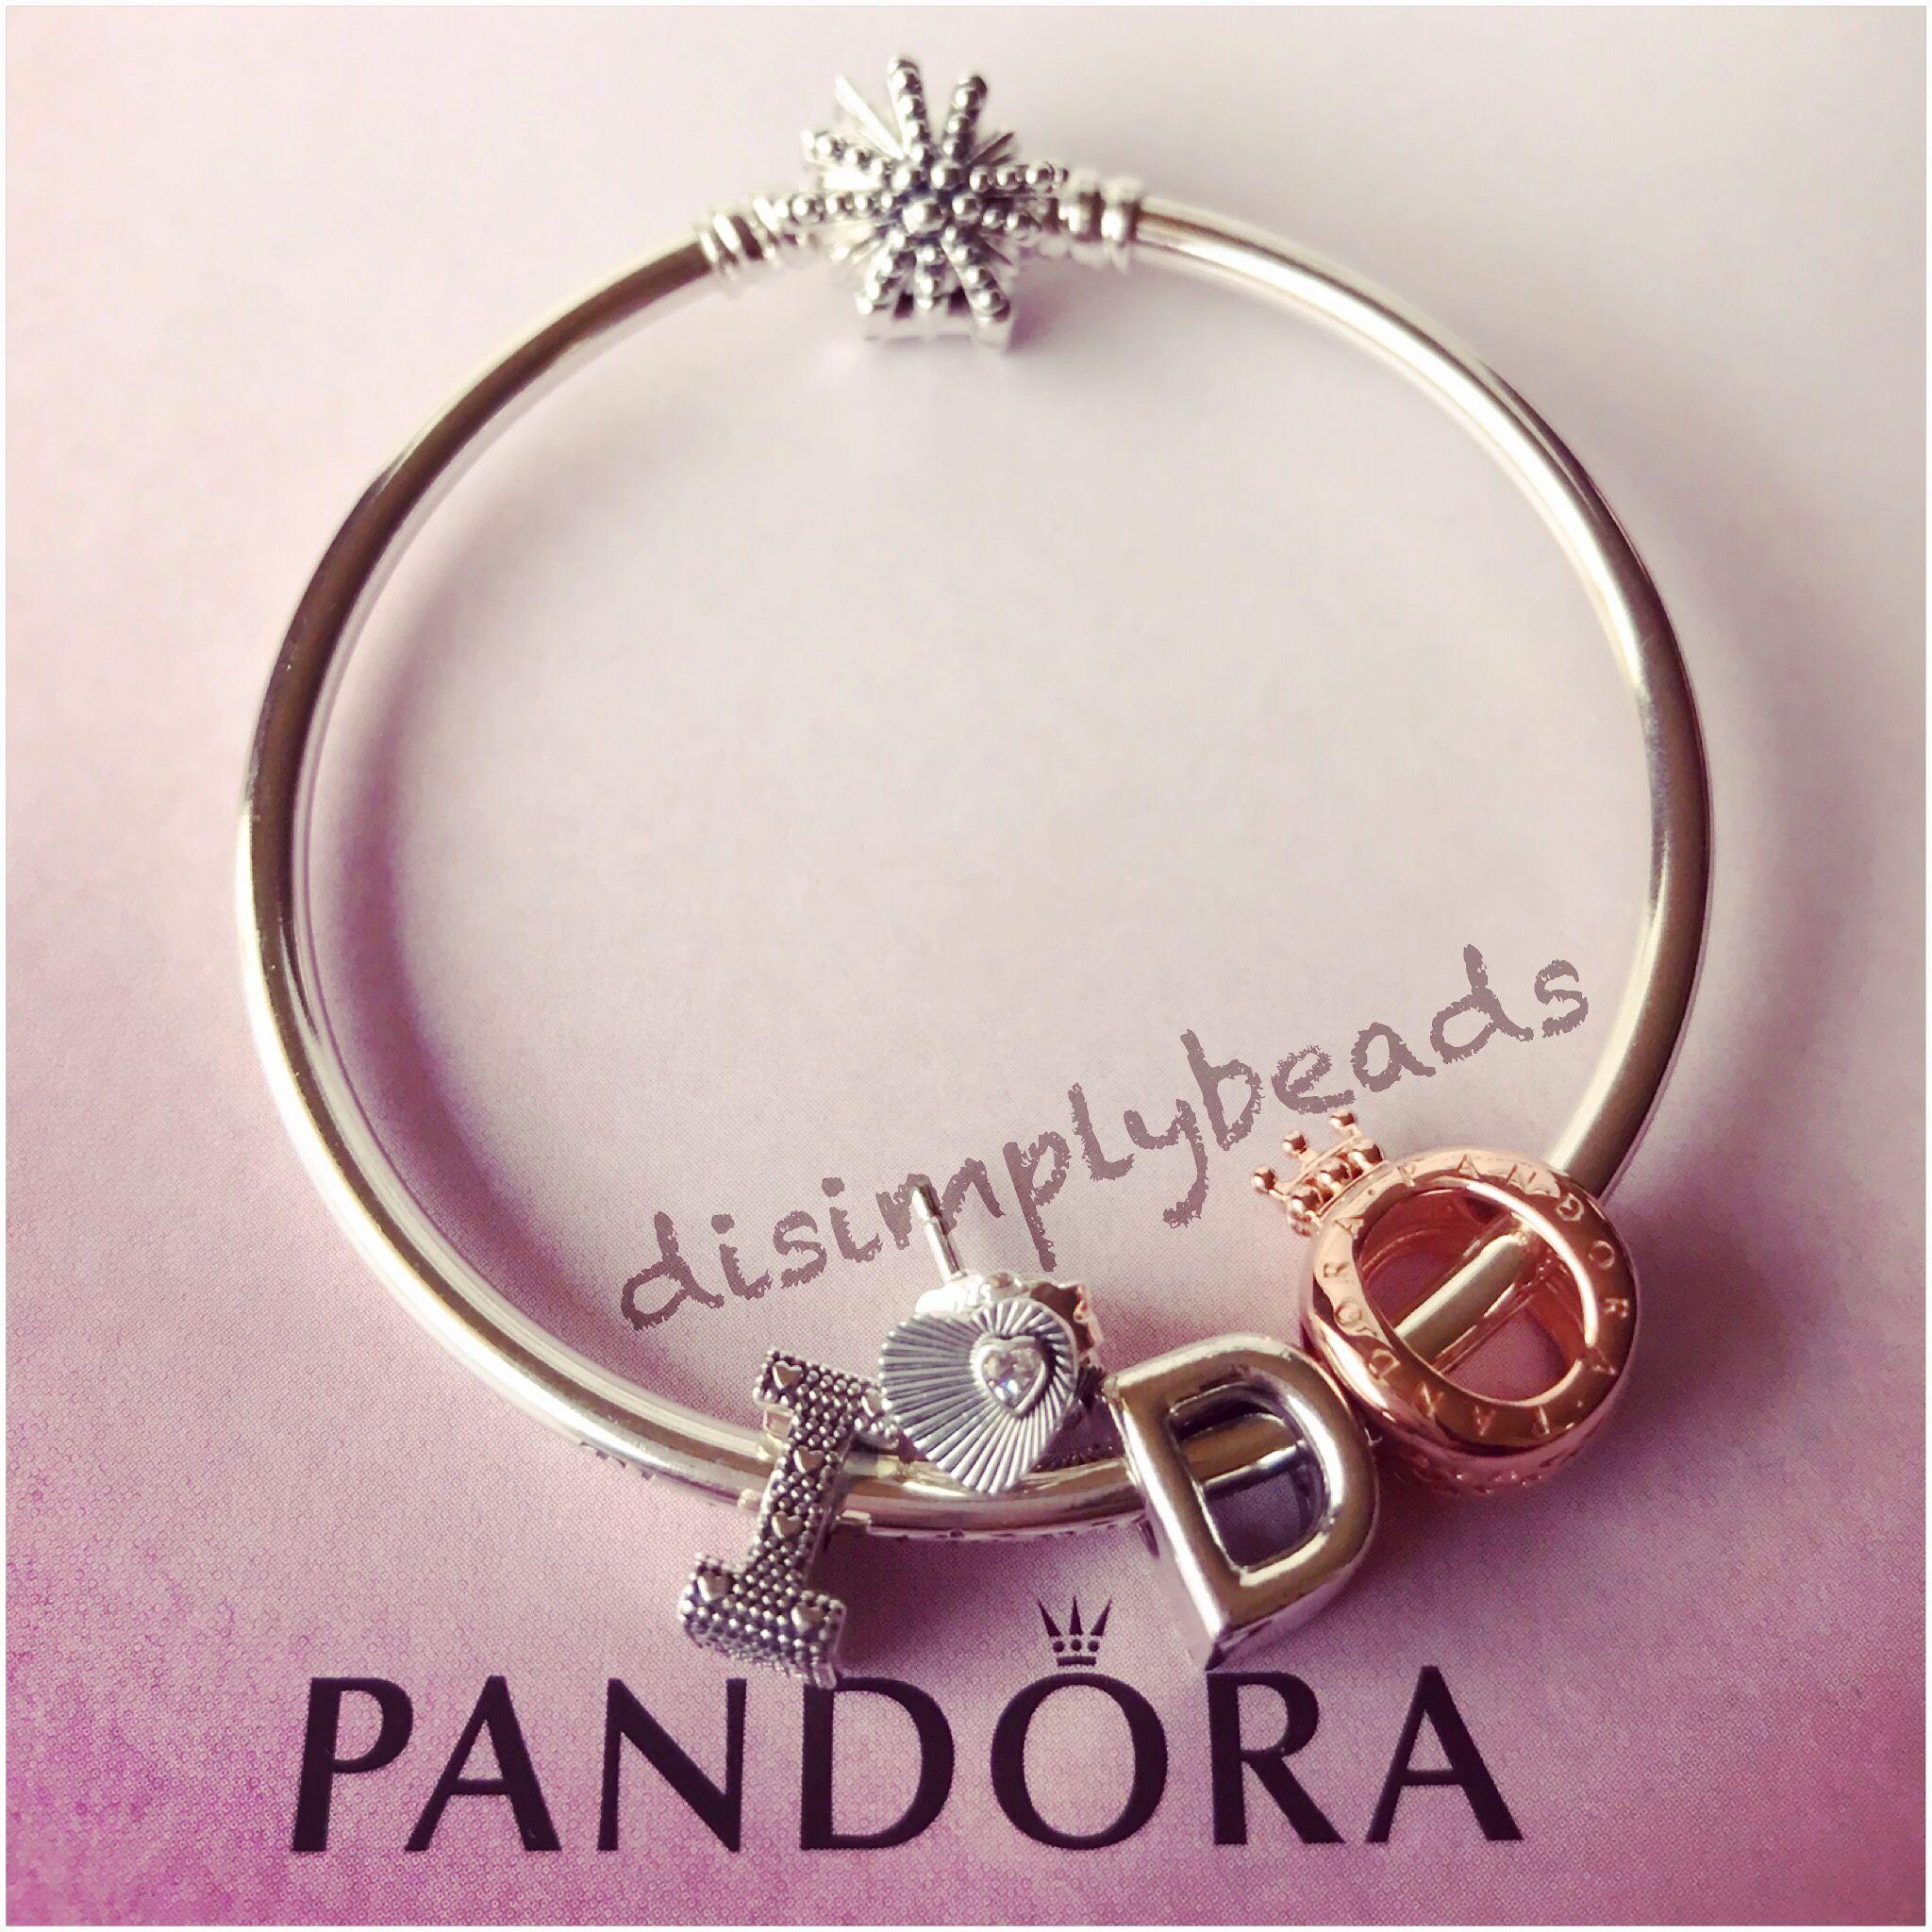 a basso prezzo c0475 219ff Pandora Christmas 2018 limited edition star bangle the best ...